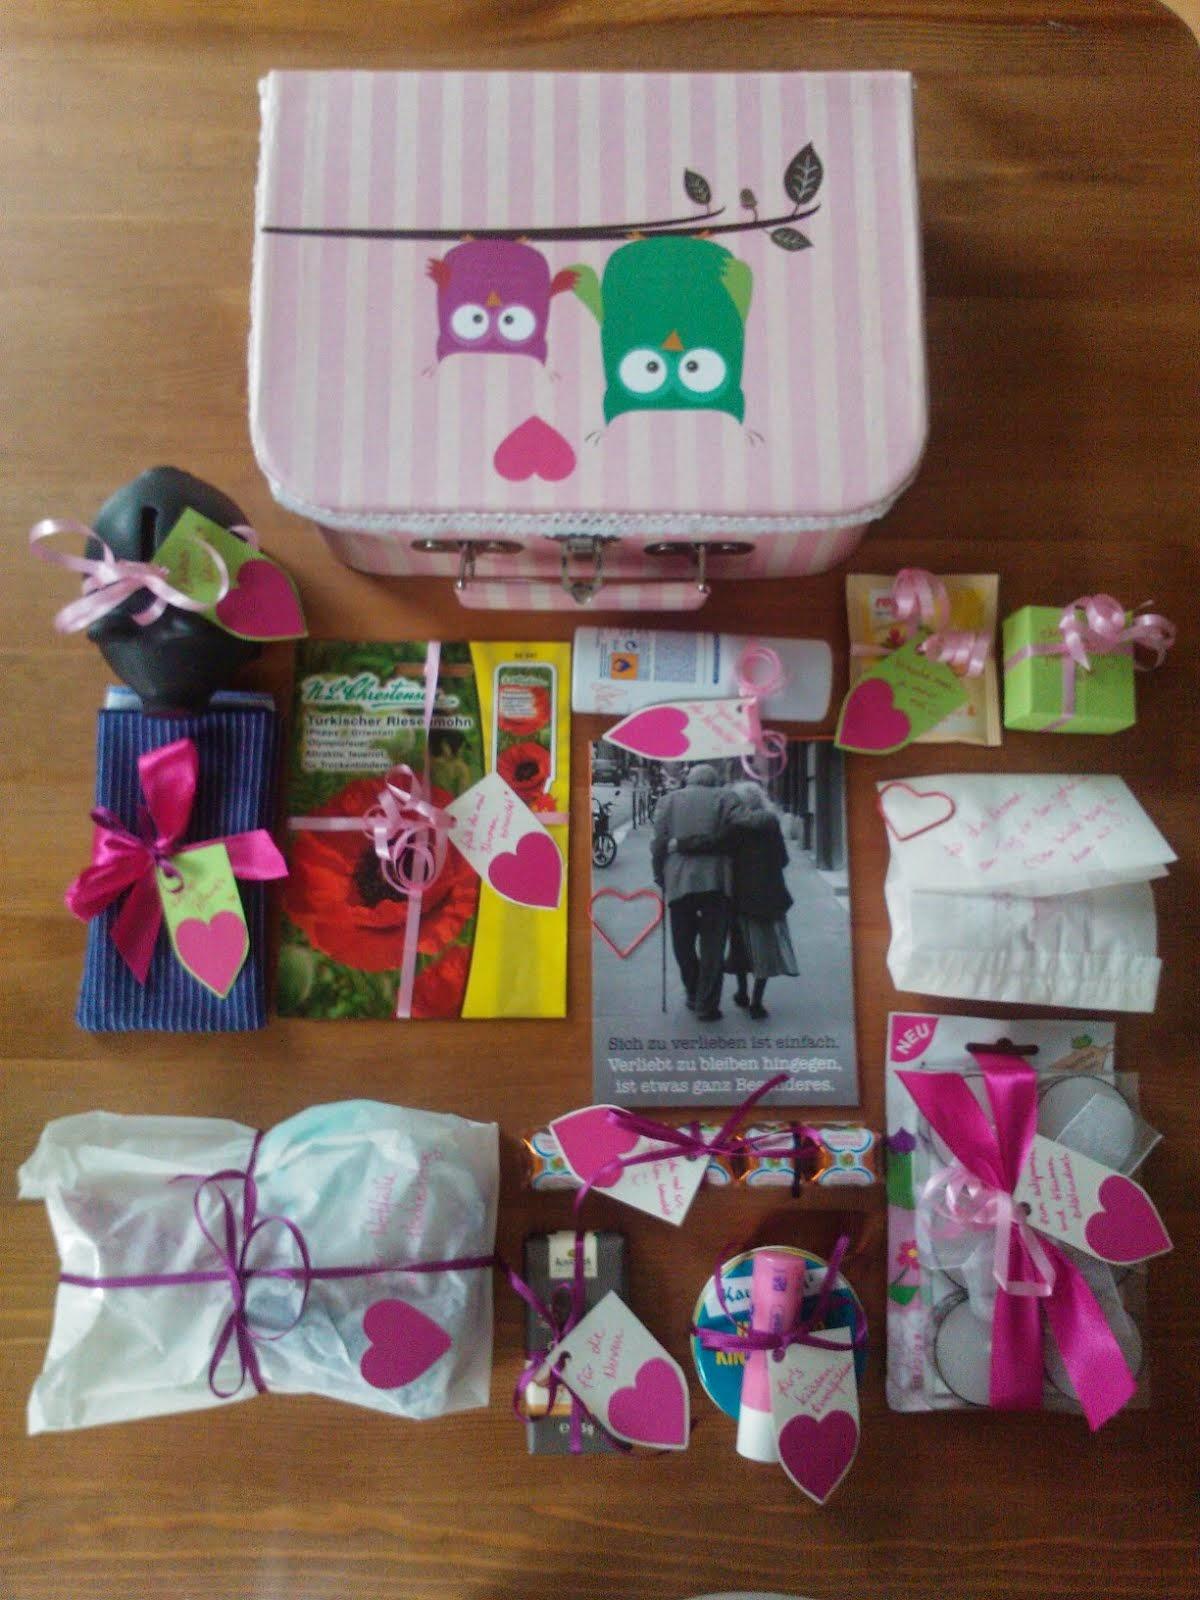 Mademoiselle Limettenfalter Erste Hilfe Koffer Fur Die Braut In Spe